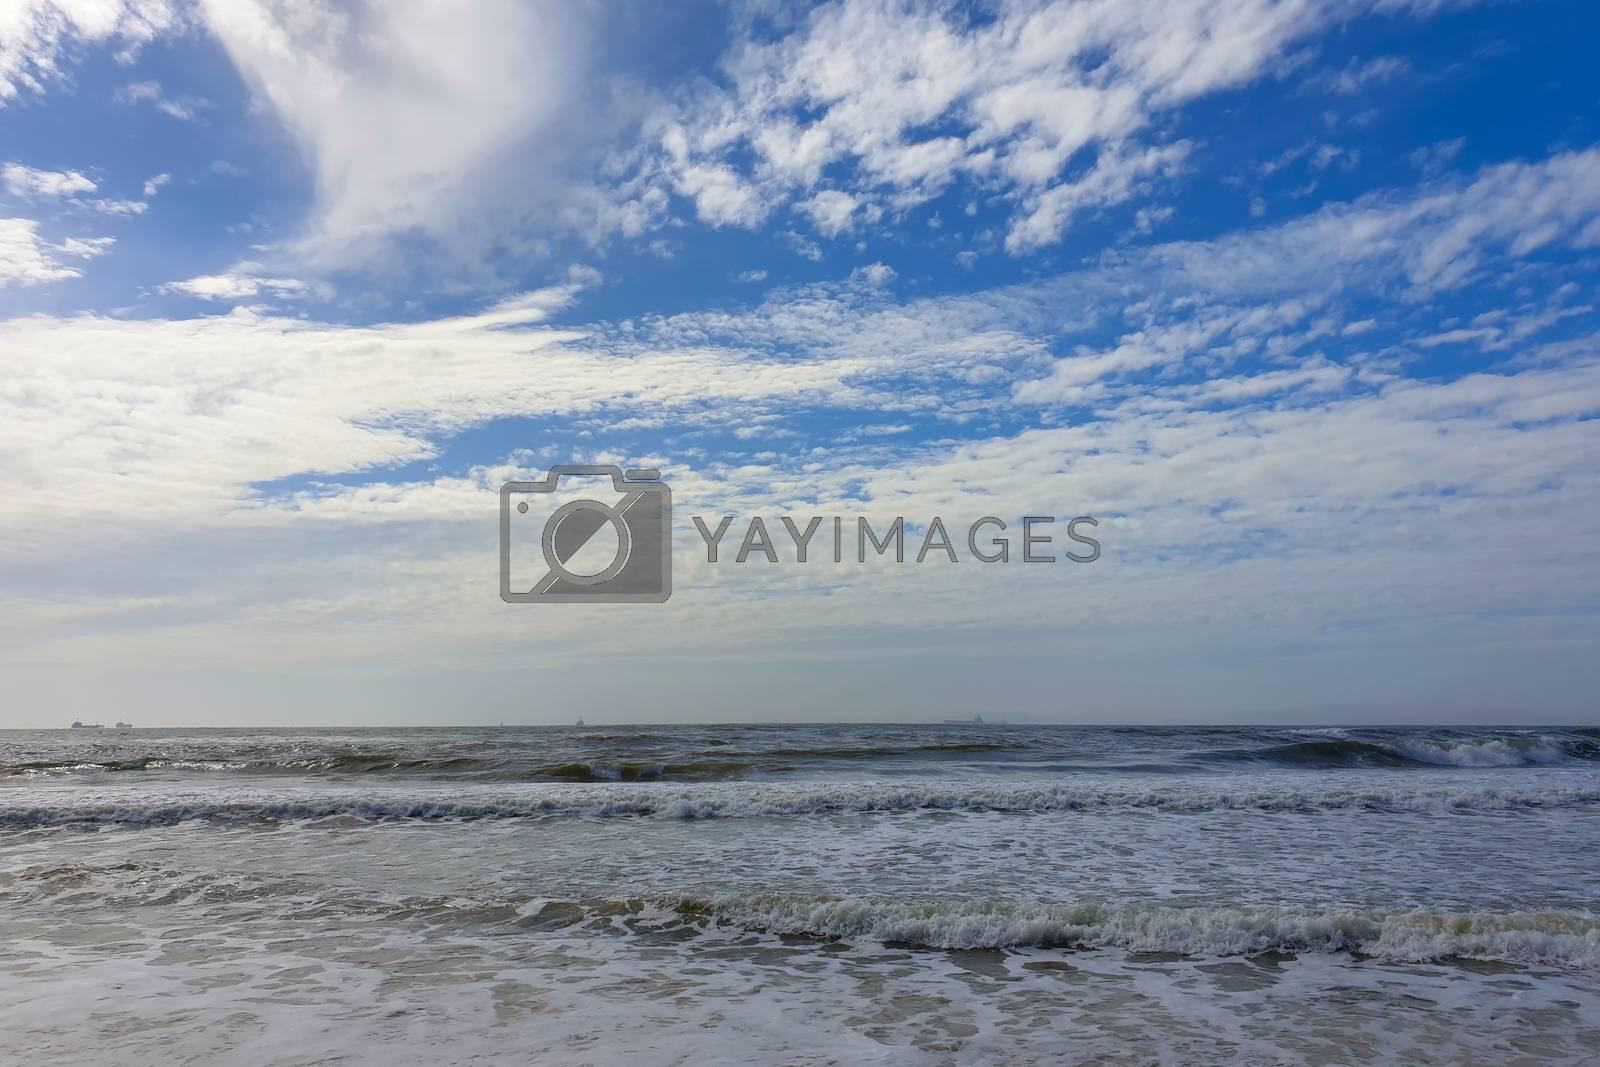 Muddy sea. Seascape and cloudy sky. Waves of muddy sea